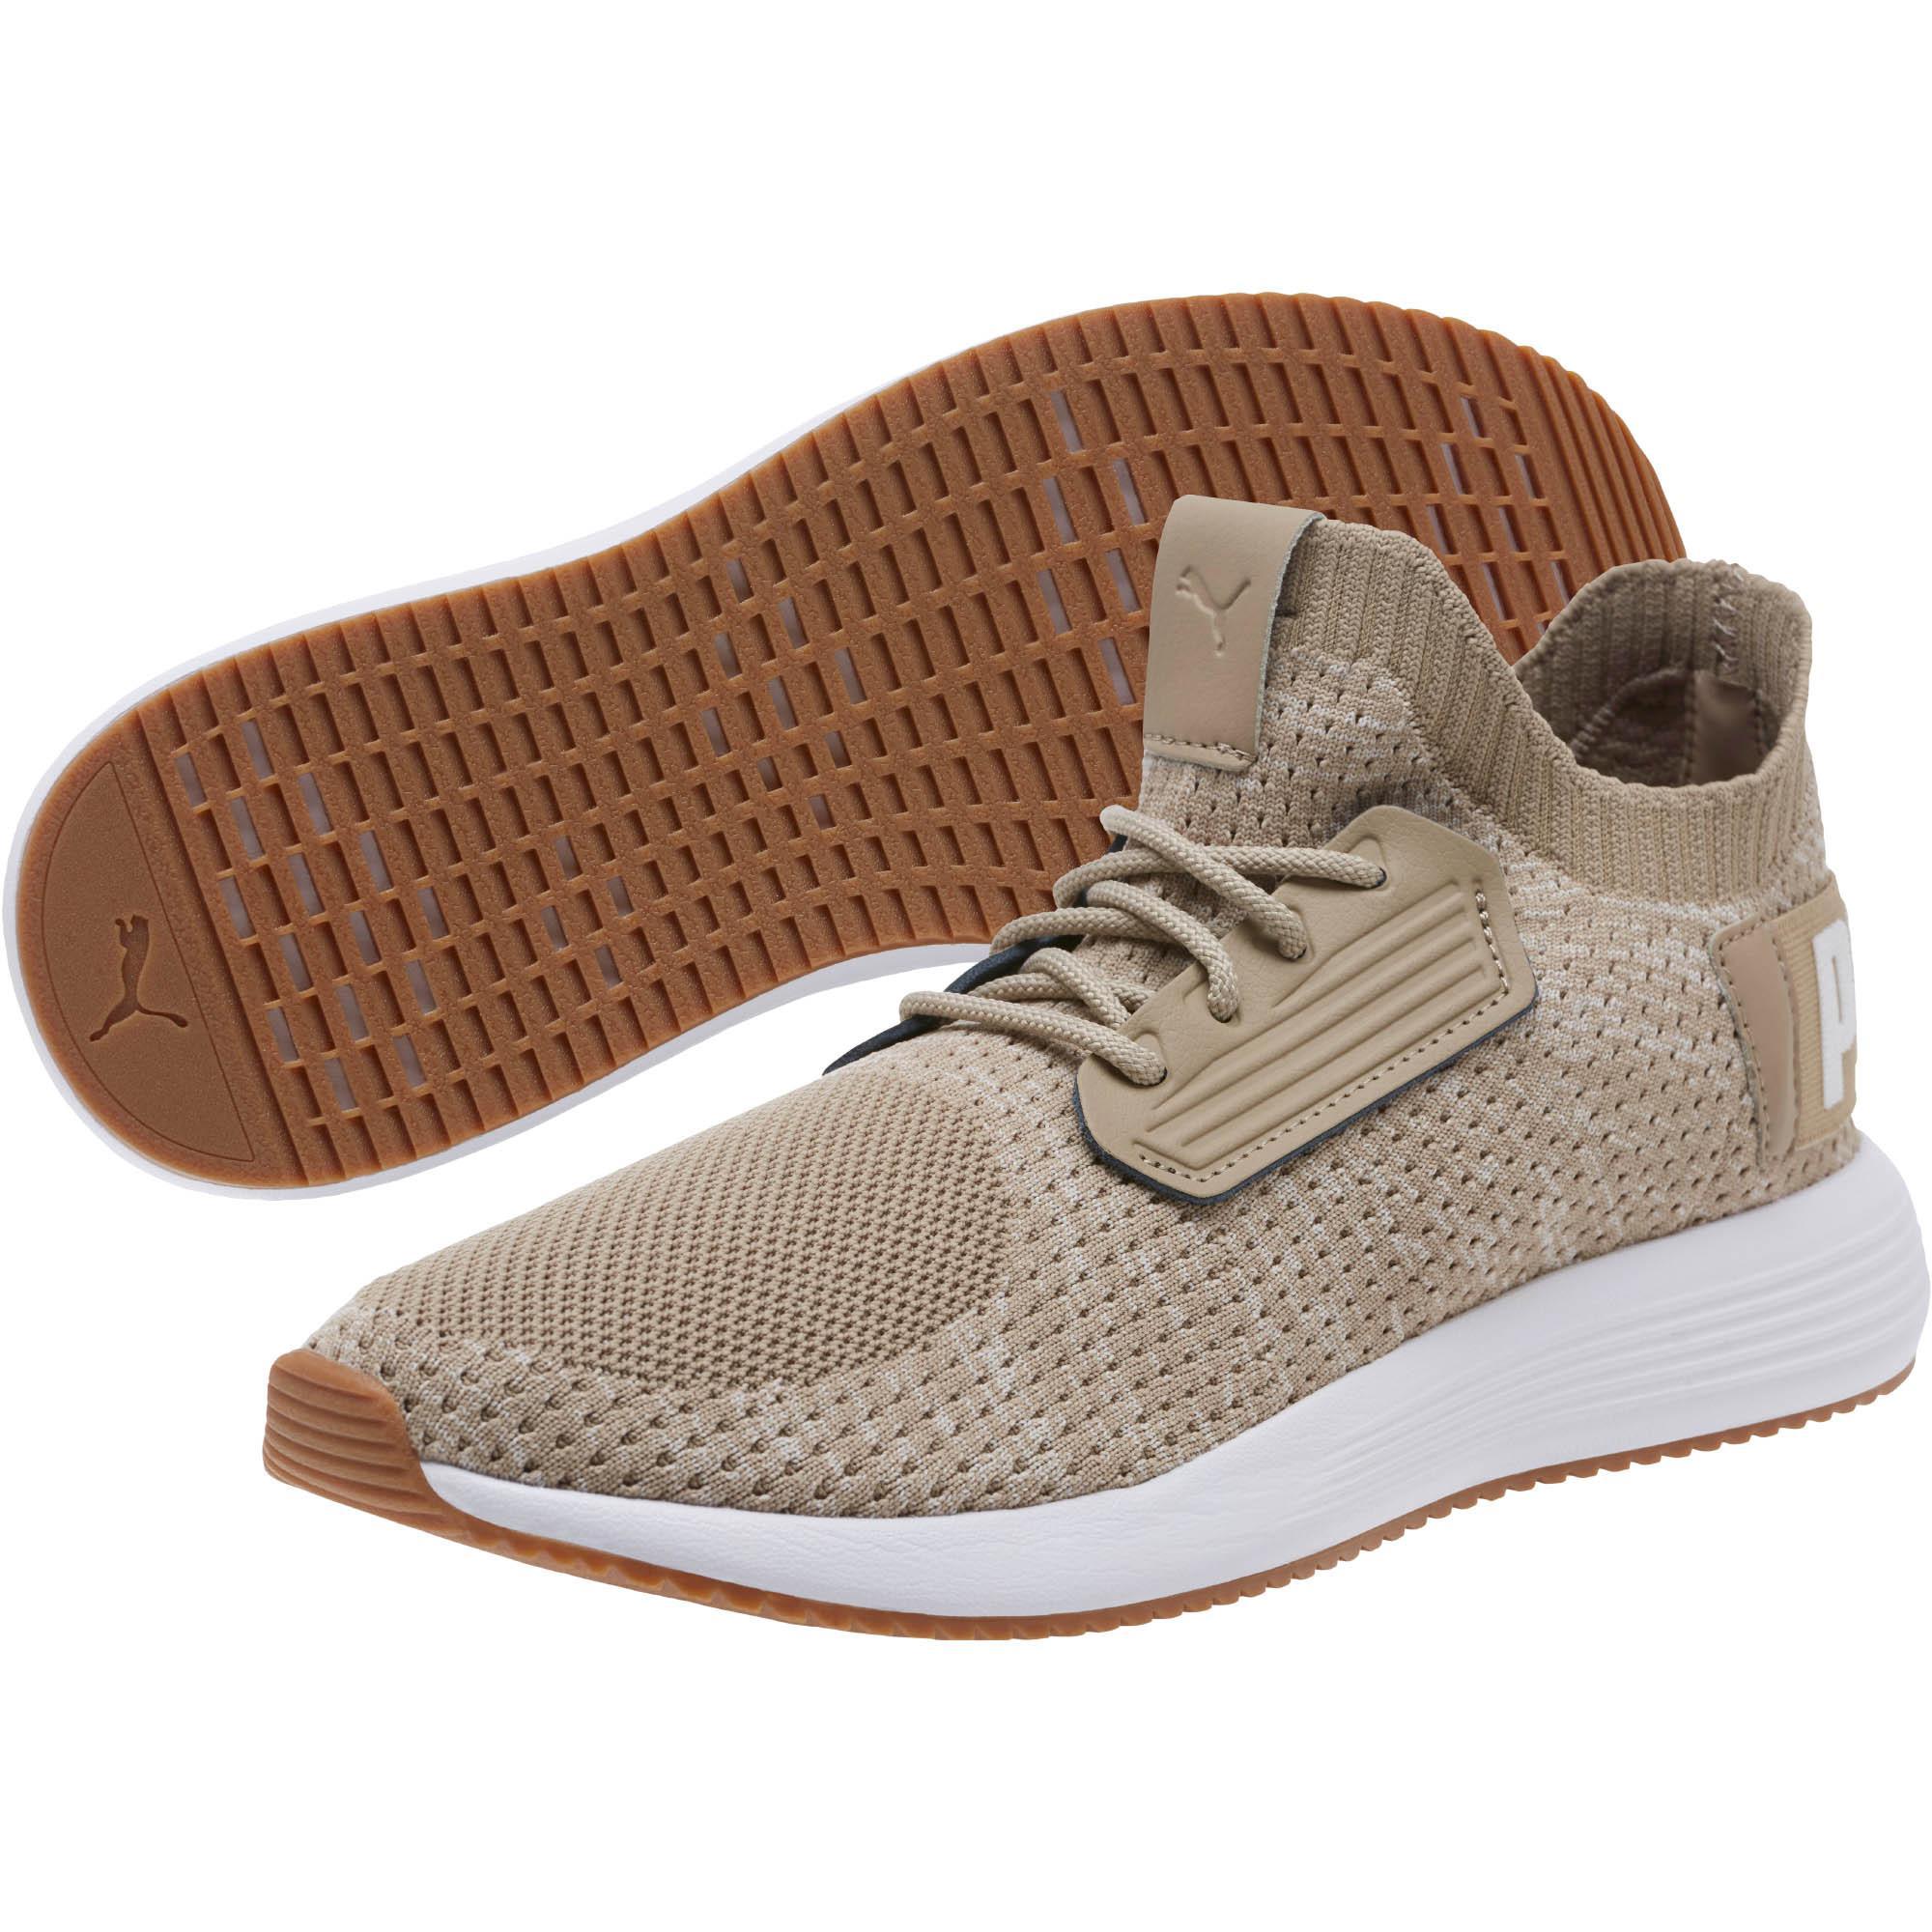 PUMA - Natural Uprise Knit Men s Sneakers for Men - Lyst. View fullscreen 649b55ba3